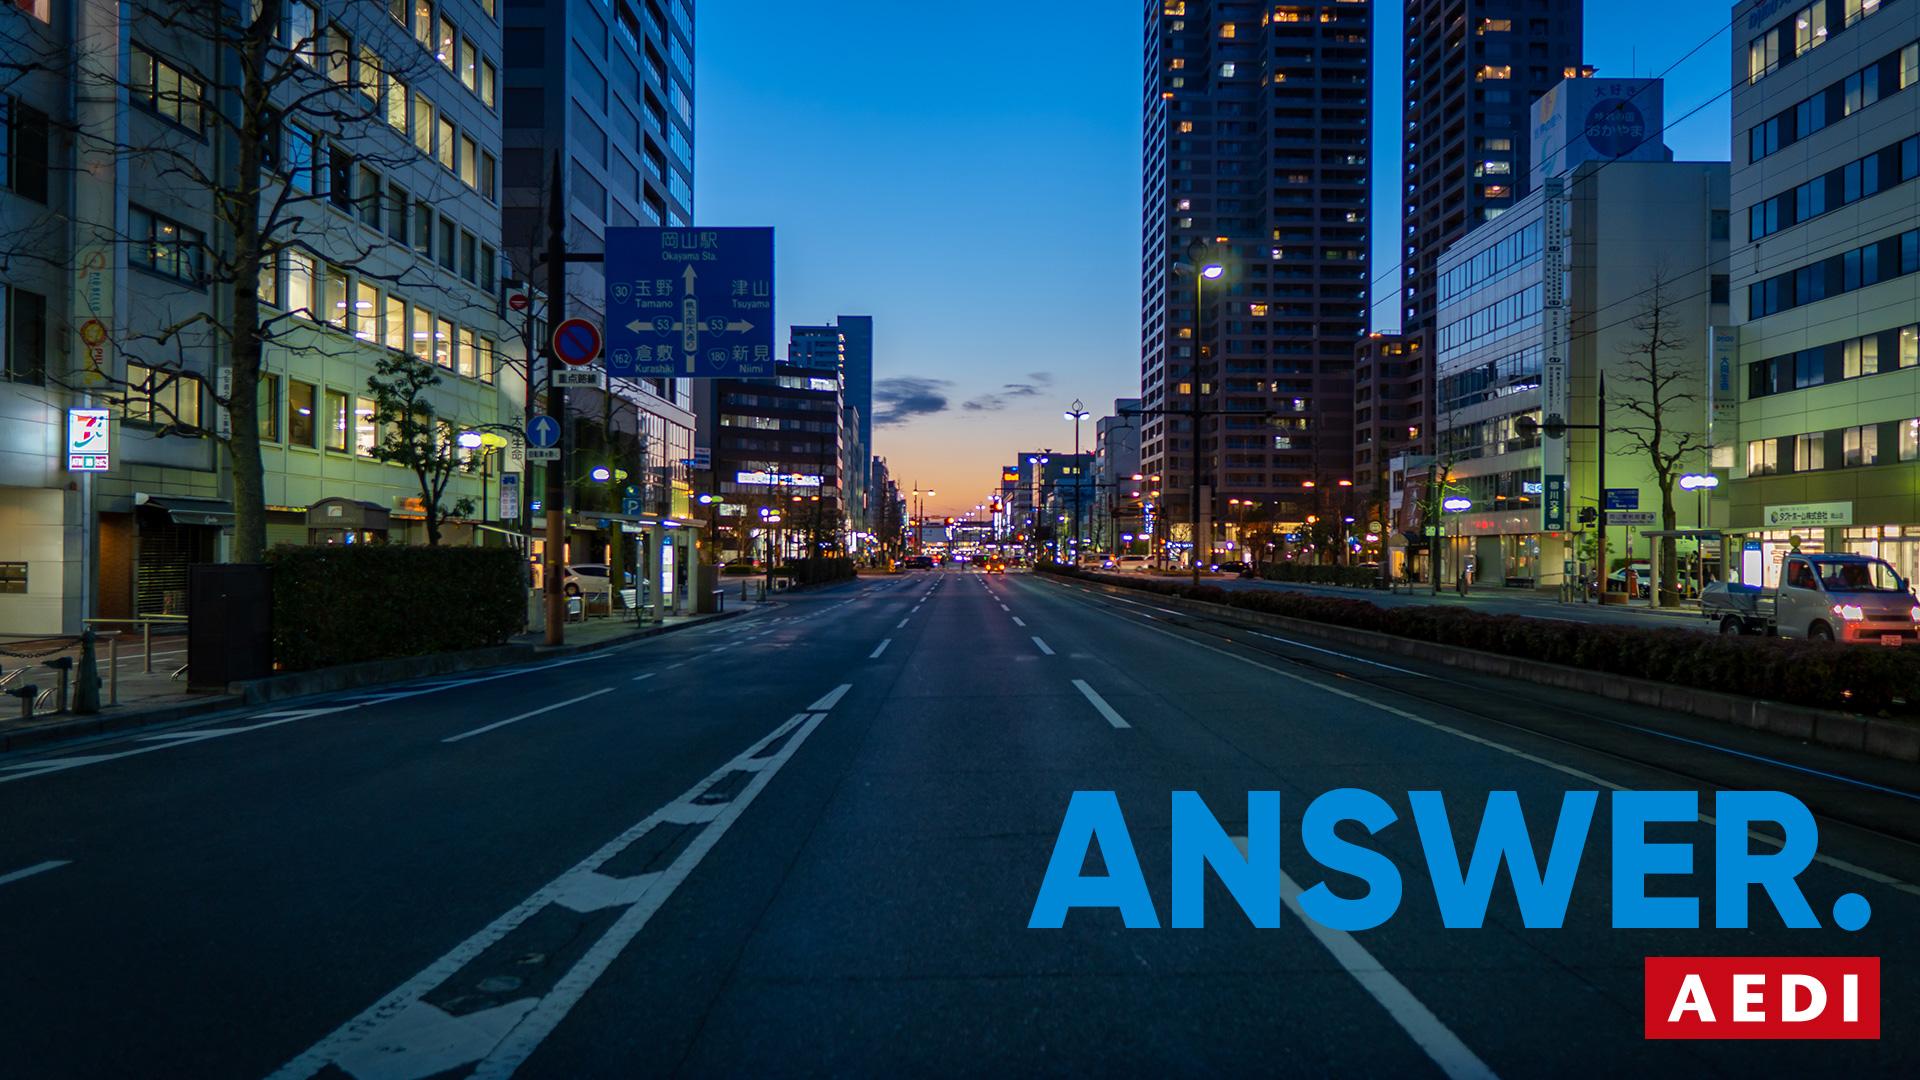 ANSWER. 岡山県岡山市 デザインの答えを見つける。